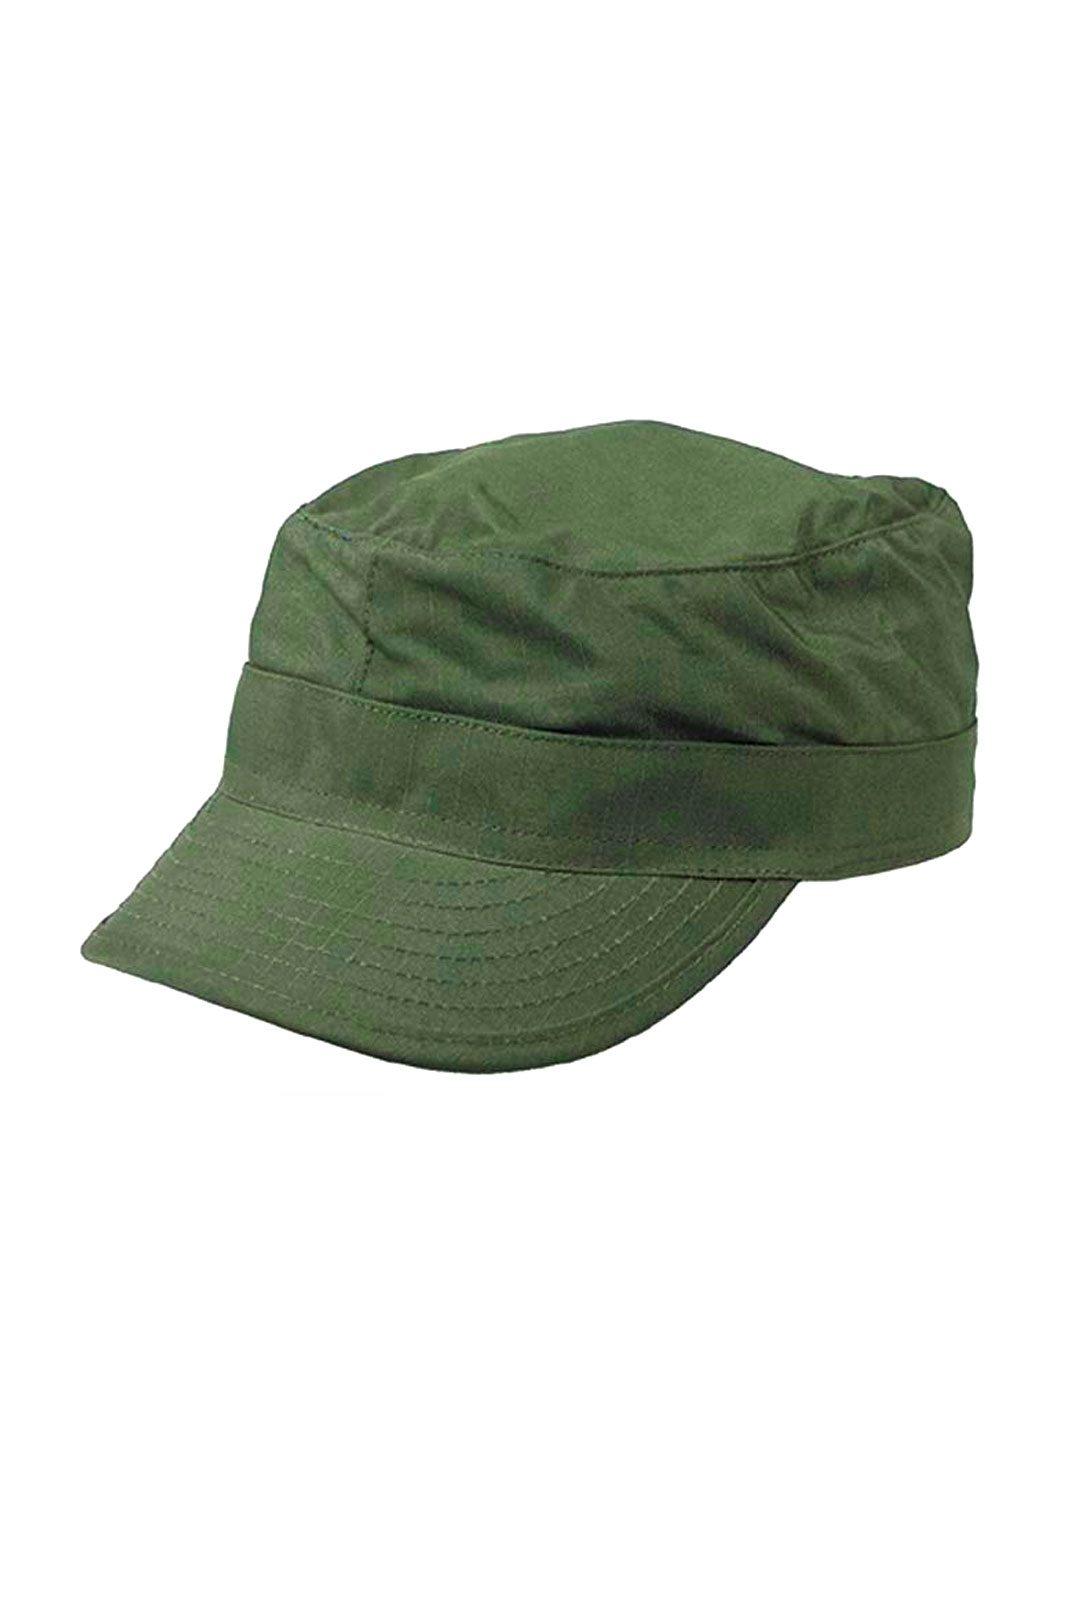 US BDU Field Cap Rip Stop Olive Green